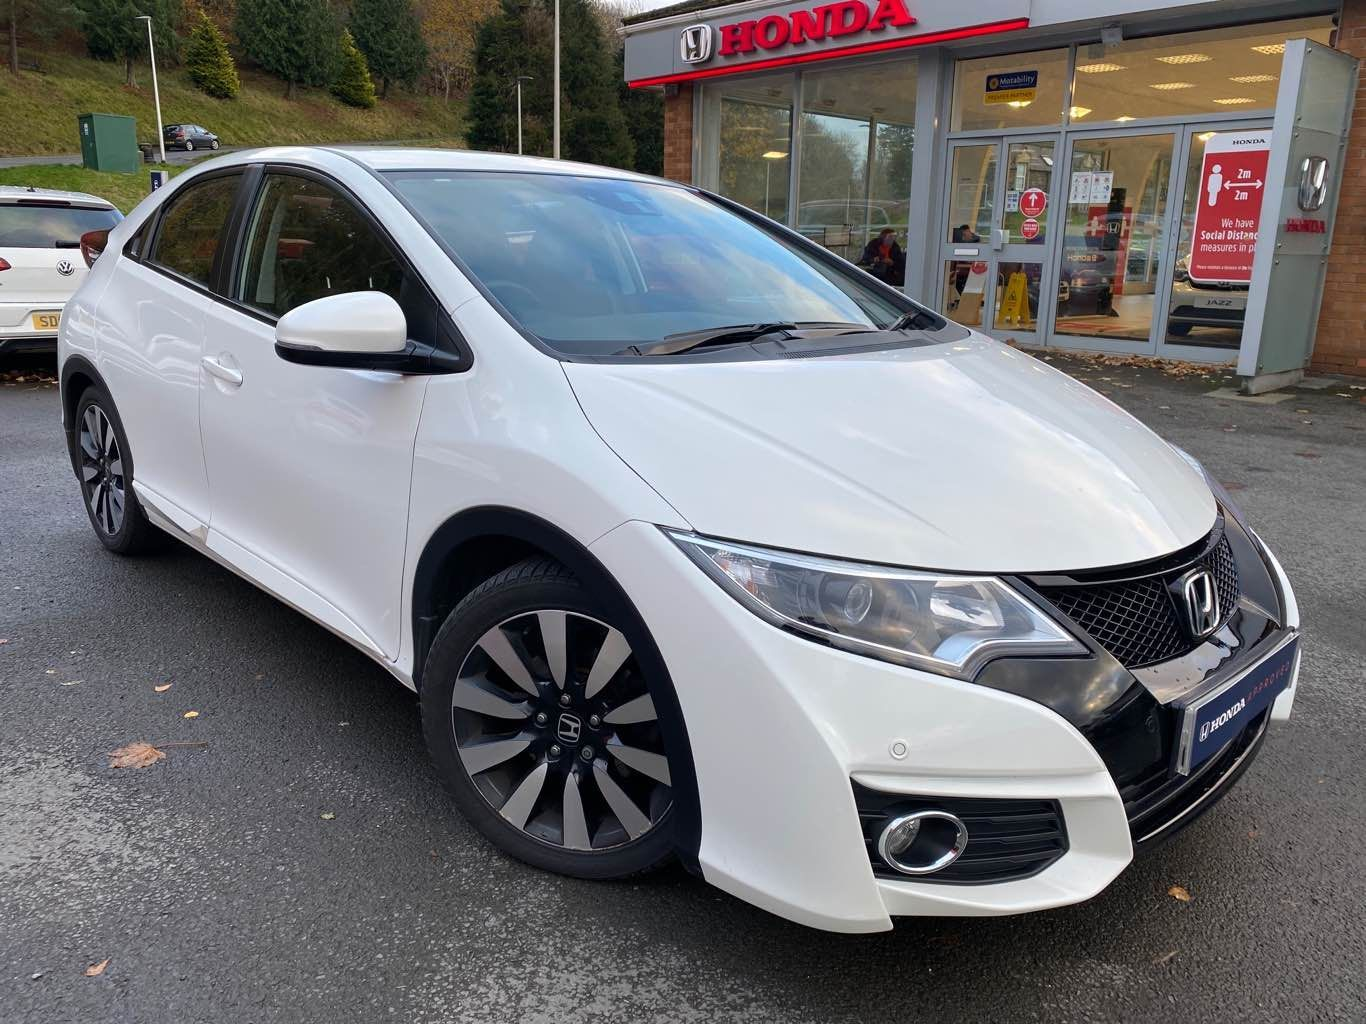 Honda Civic 1.8I VTEC SE Plus Navi